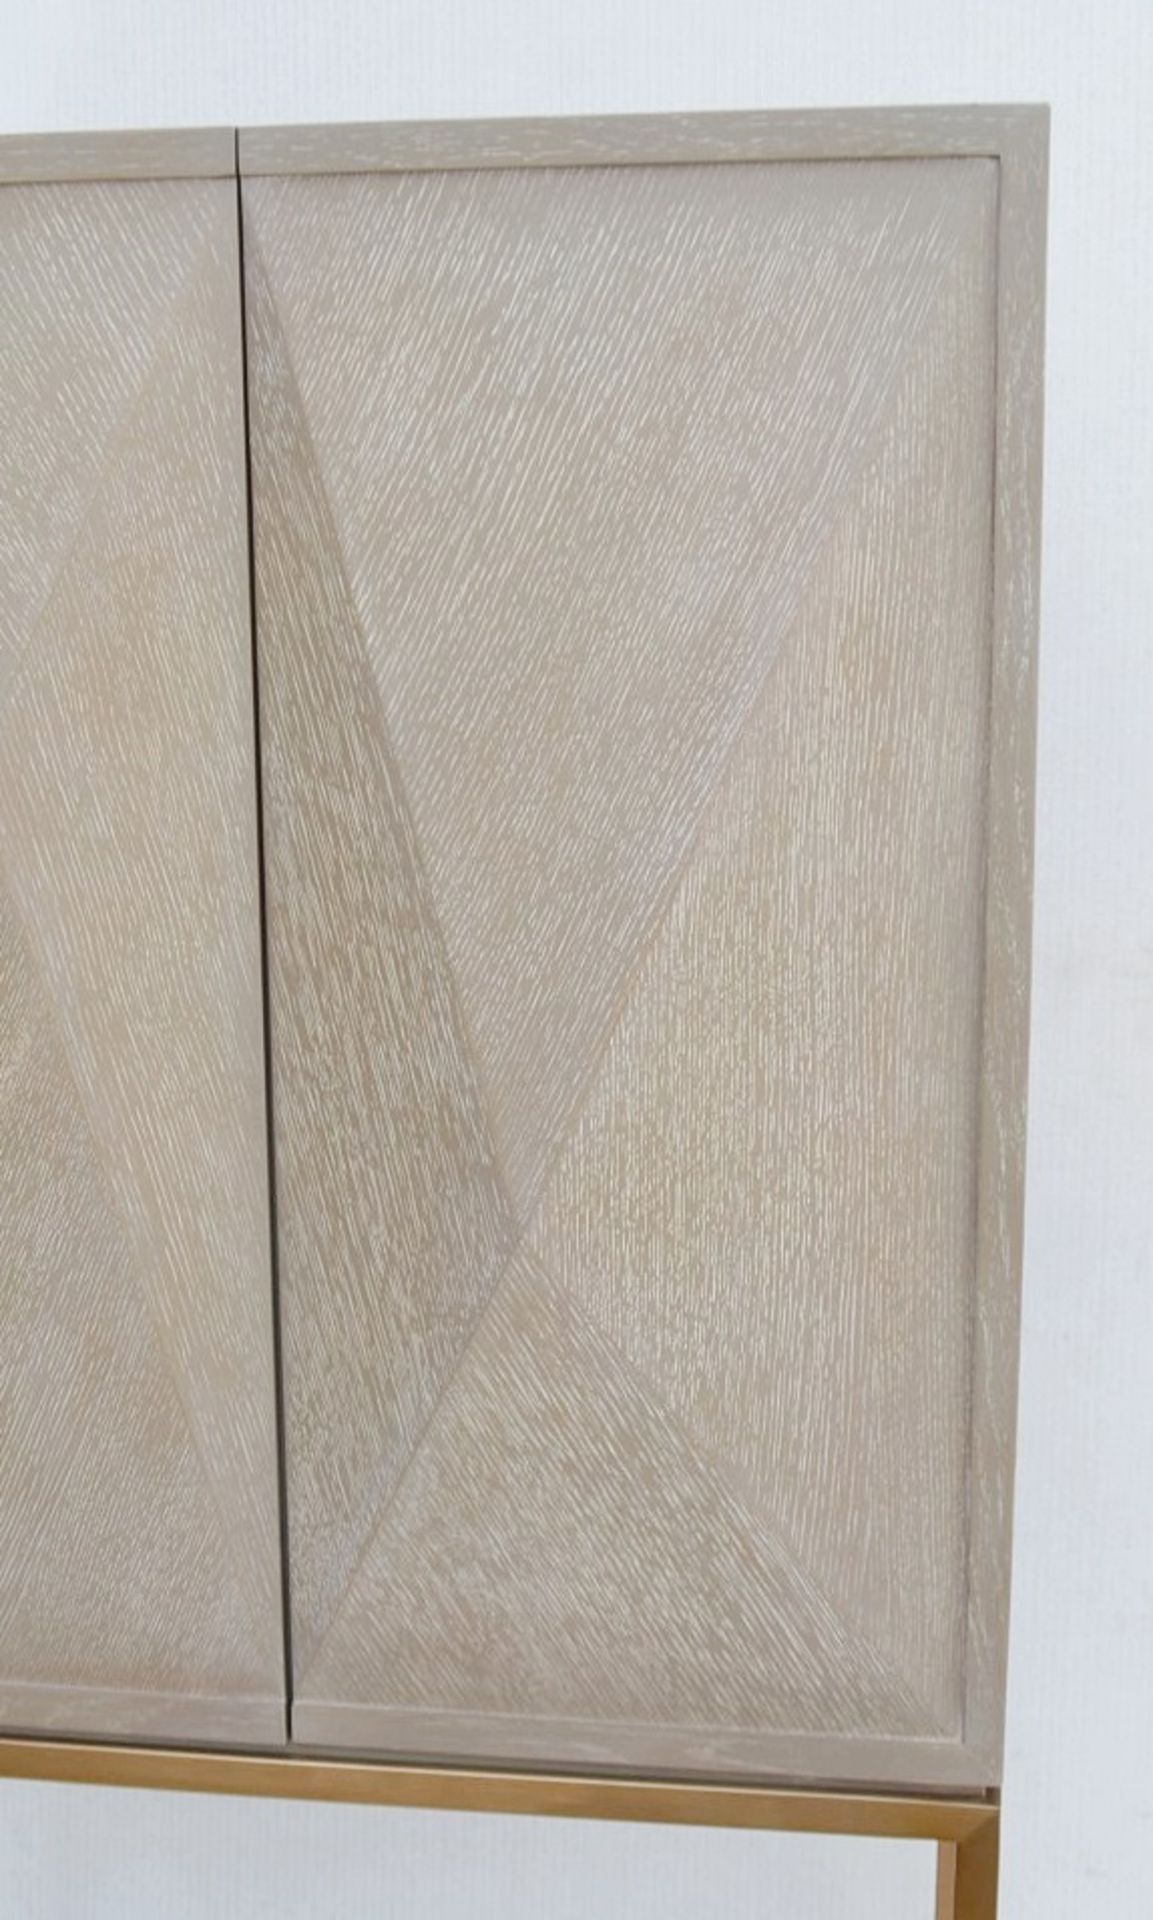 1 x EICHHOLTZ 'Delarenta' Wine Cabinet In Washed Oak And Brass - Original RRP £3,289 - Image 3 of 11